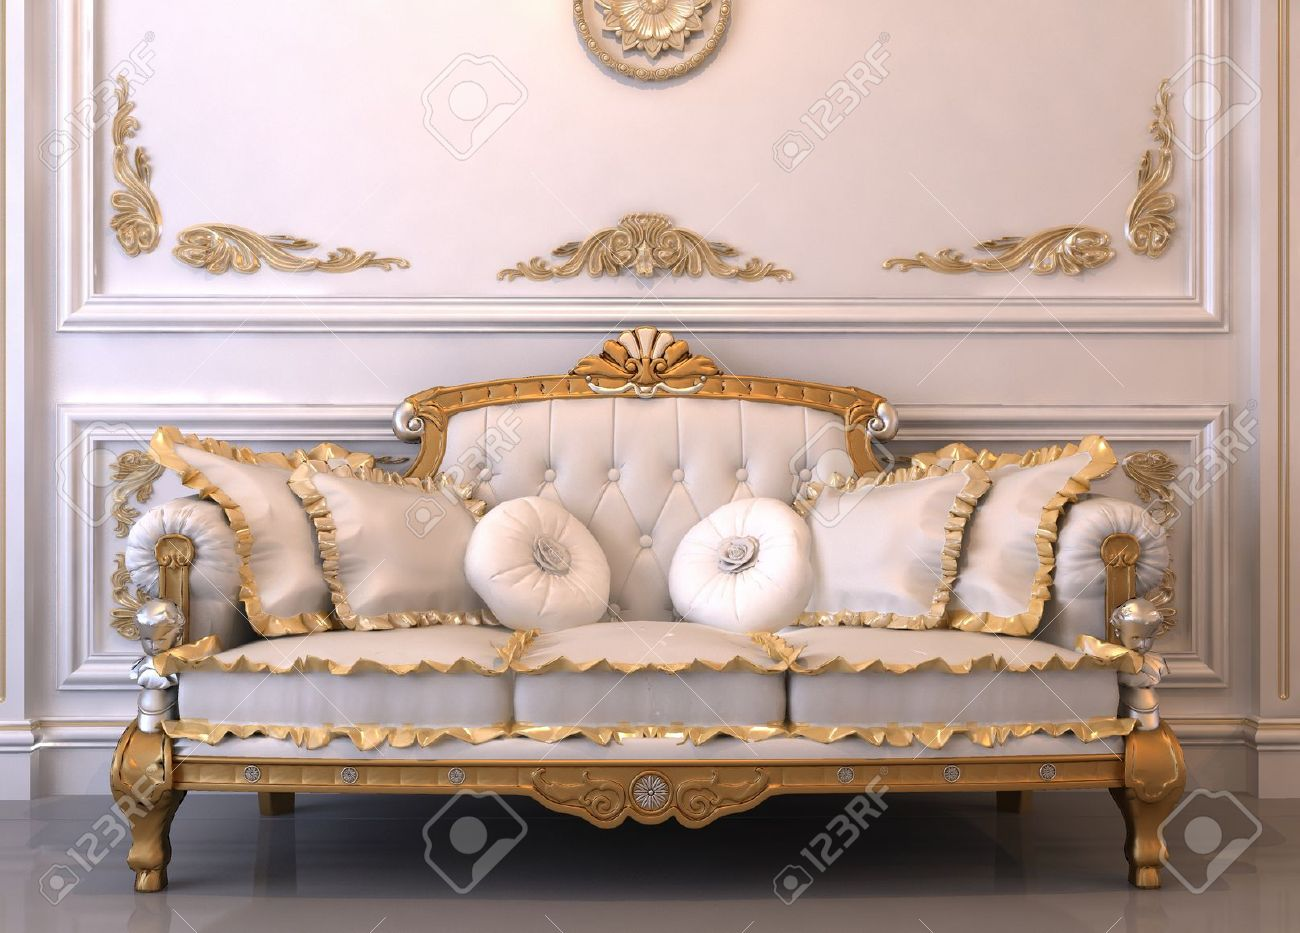 cuscini per hotel ~ fedi nuziali prezzi brescia ~ migliore